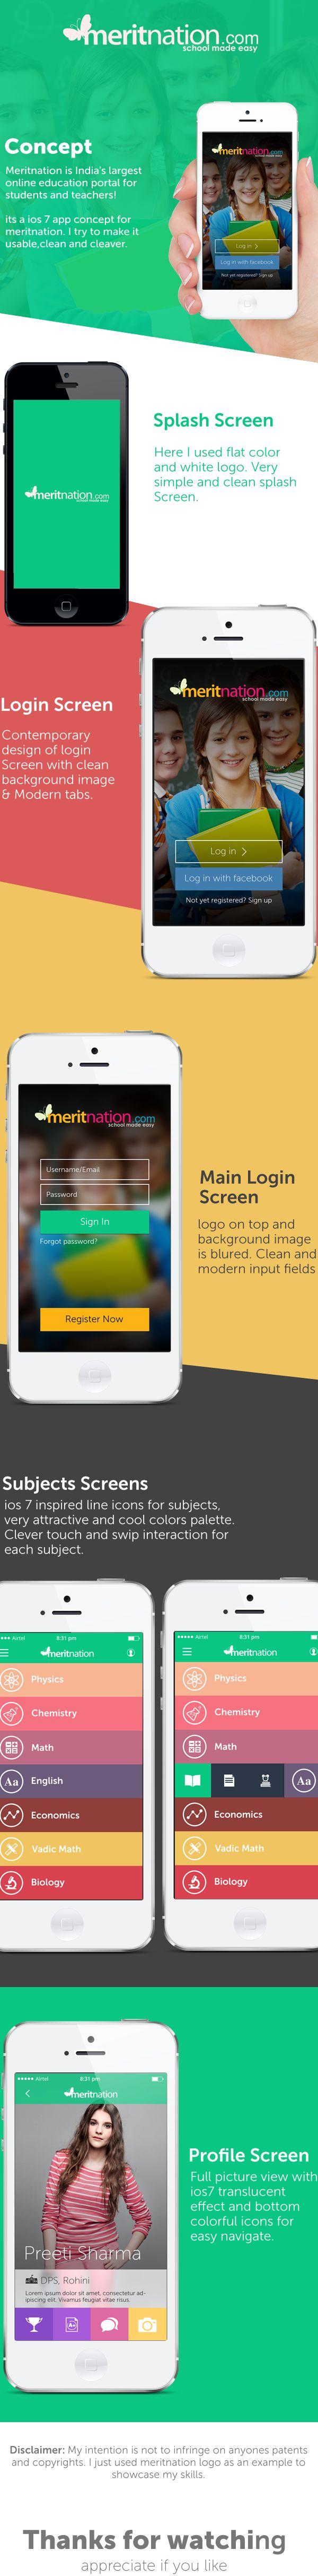 Meritnation ios App Redesing (COPY) by Manoj Bhadana, via Behance